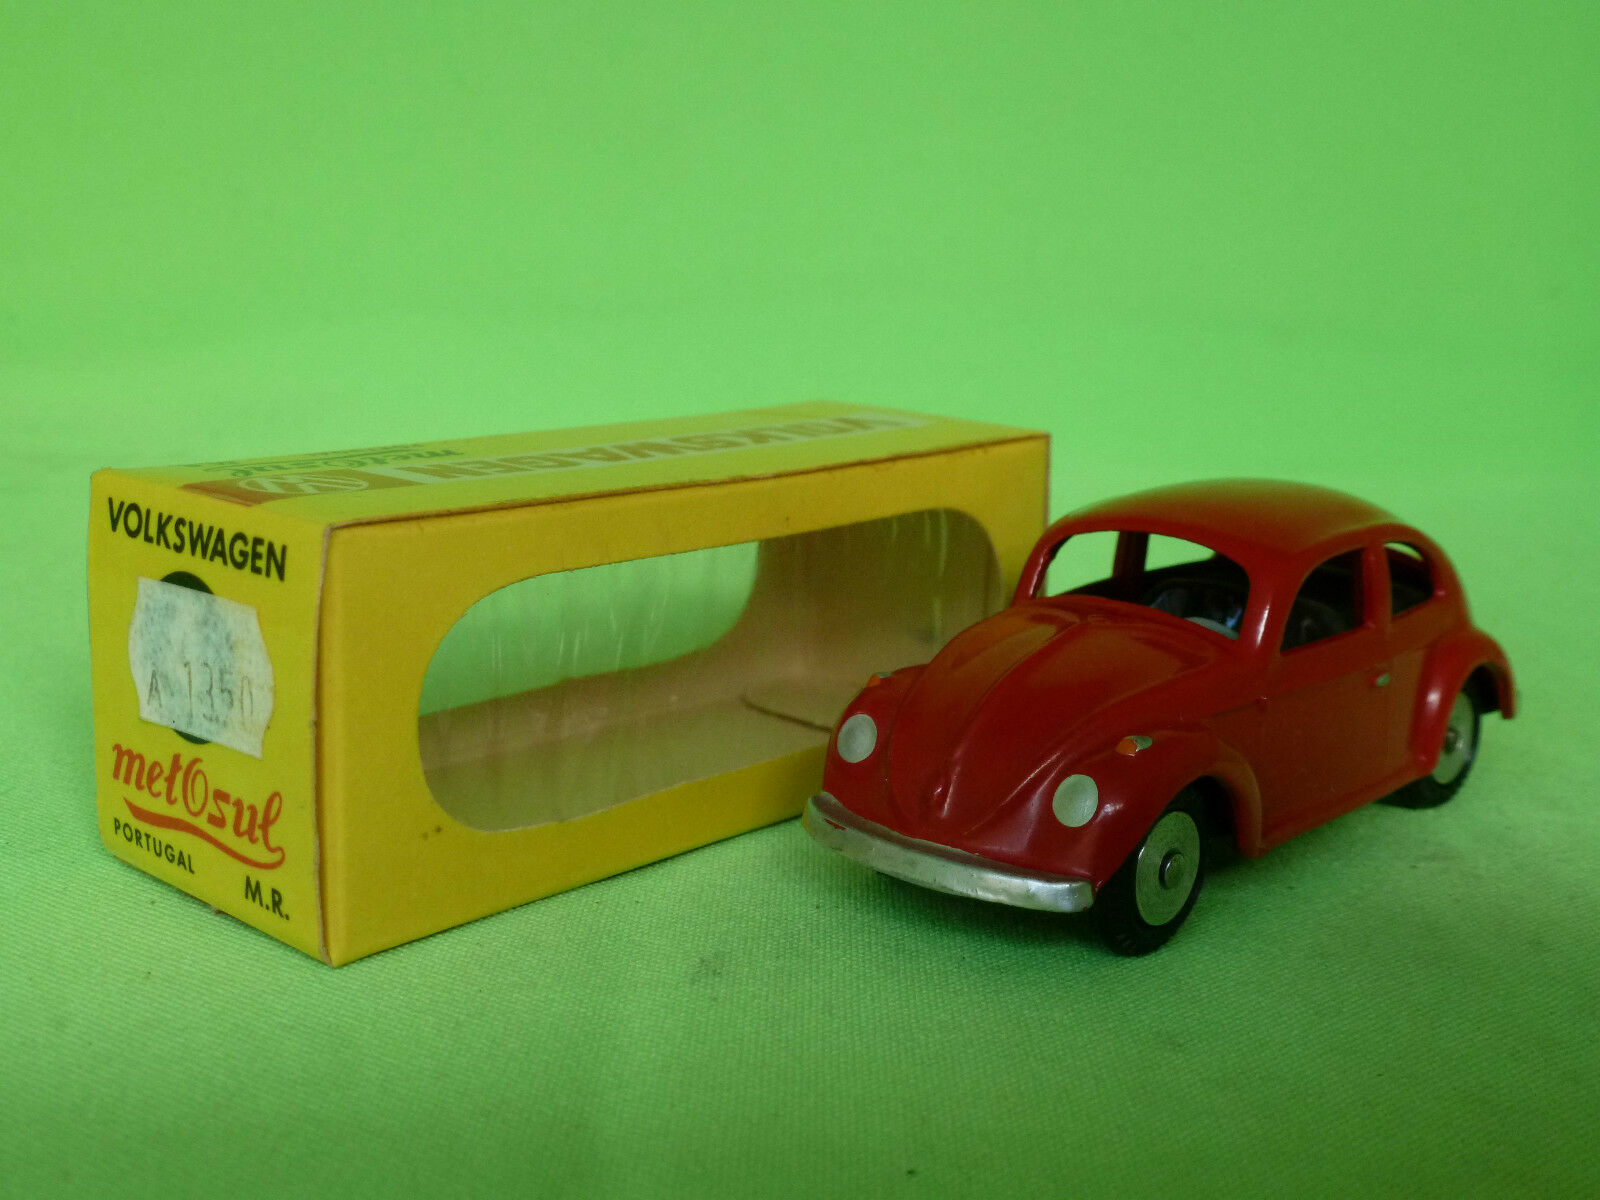 METOSUL 4 VW VOLKSWAGEN  rouge  RARE SELTEN IN EXCELLENT CONDITION IN BOX